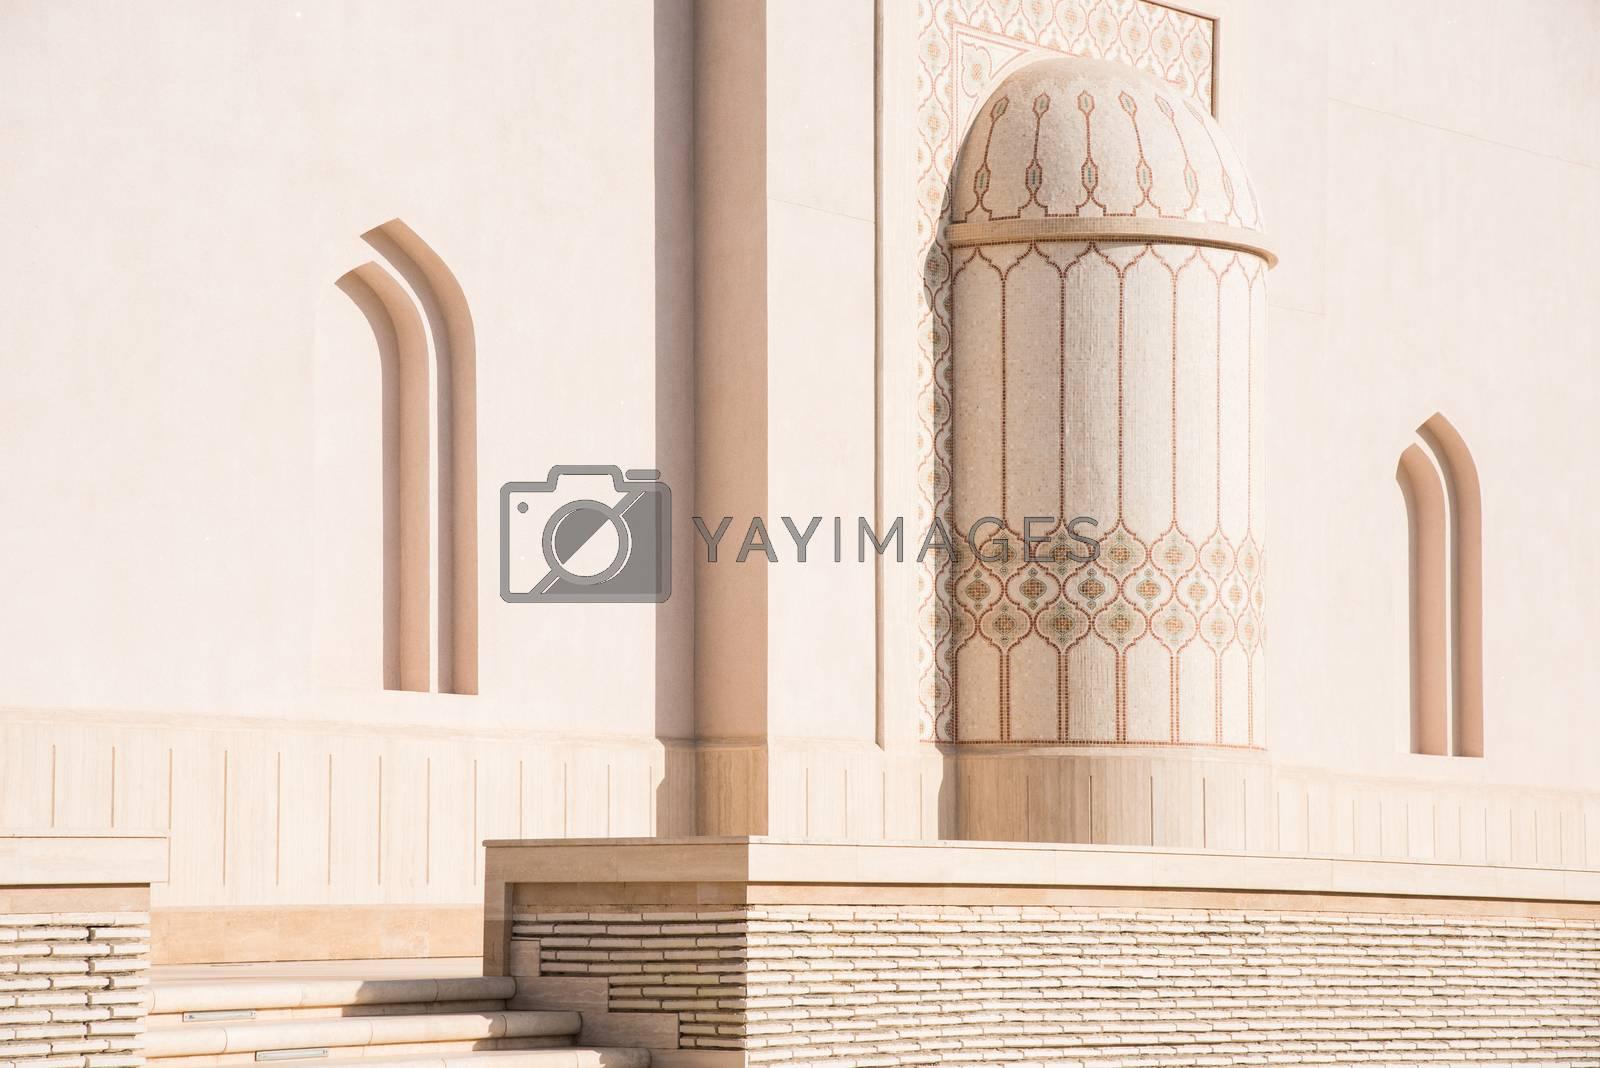 Wall detail of the Sultan Qaboos Grand Mosque in Salalah, Dhofar Region of Oman.